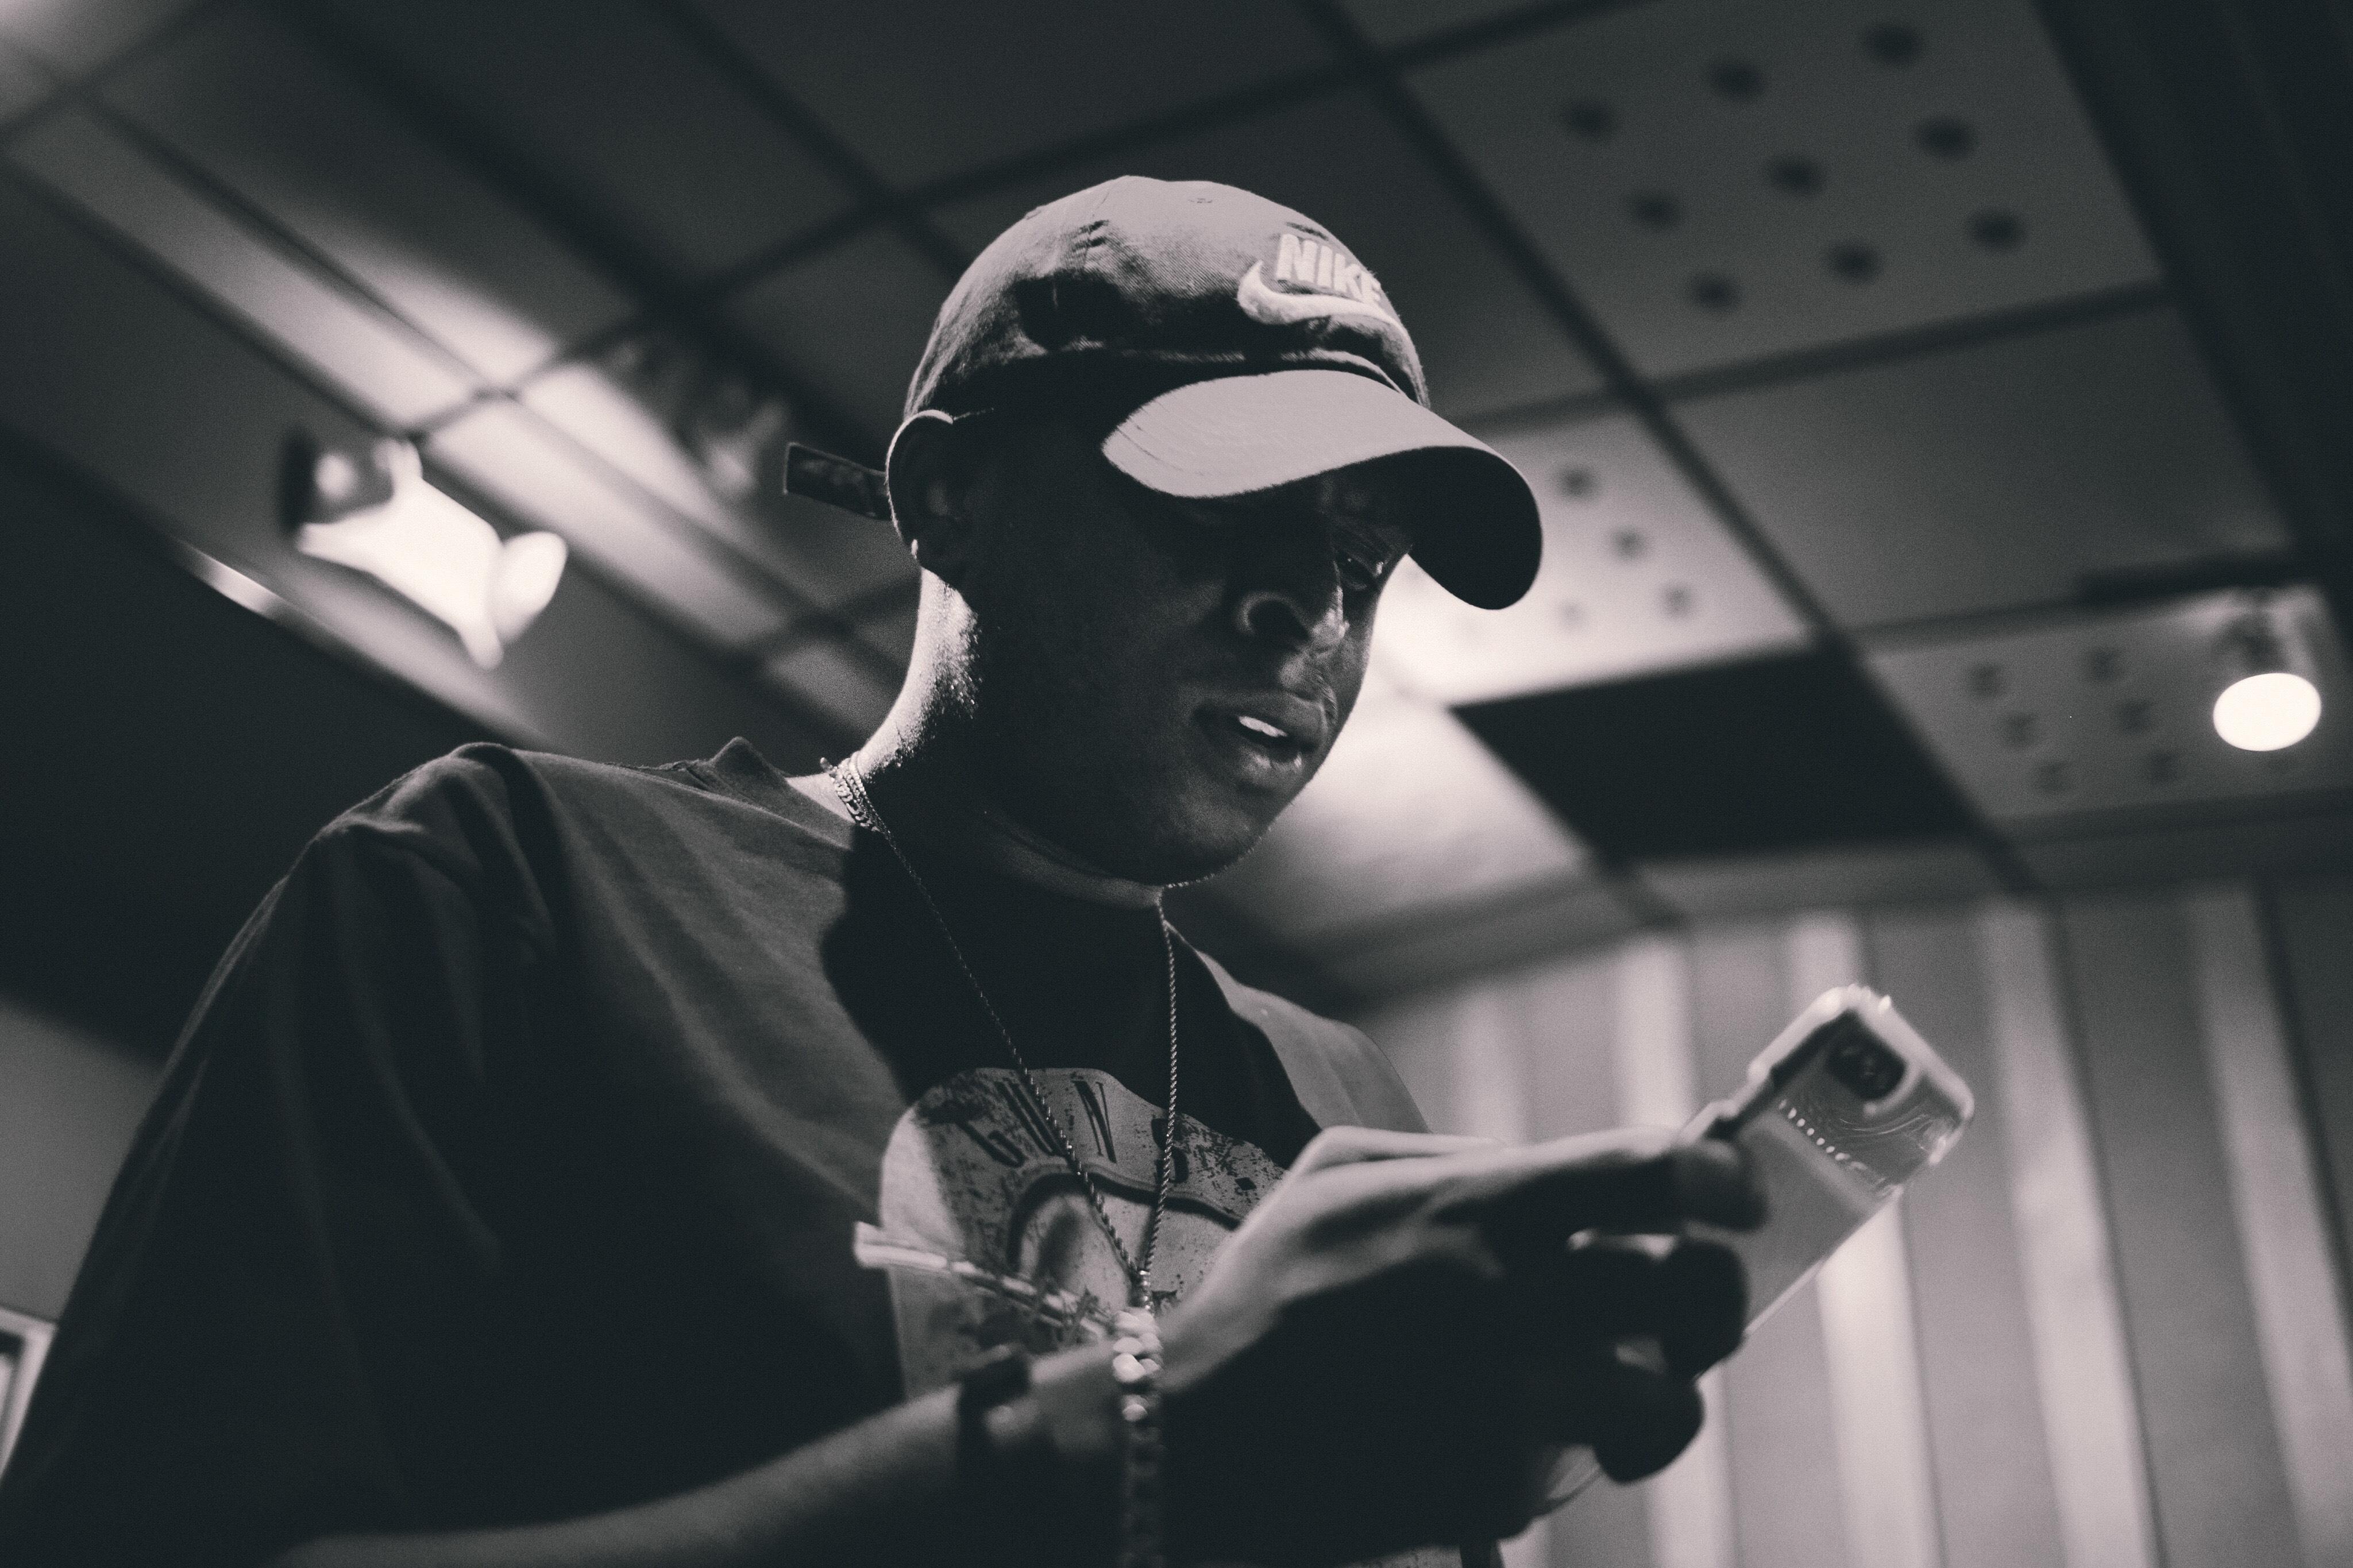 ITSBIZKIT Exclusive: Druskii Dru Talks New Single, Fan Experiences, Creative Process & More